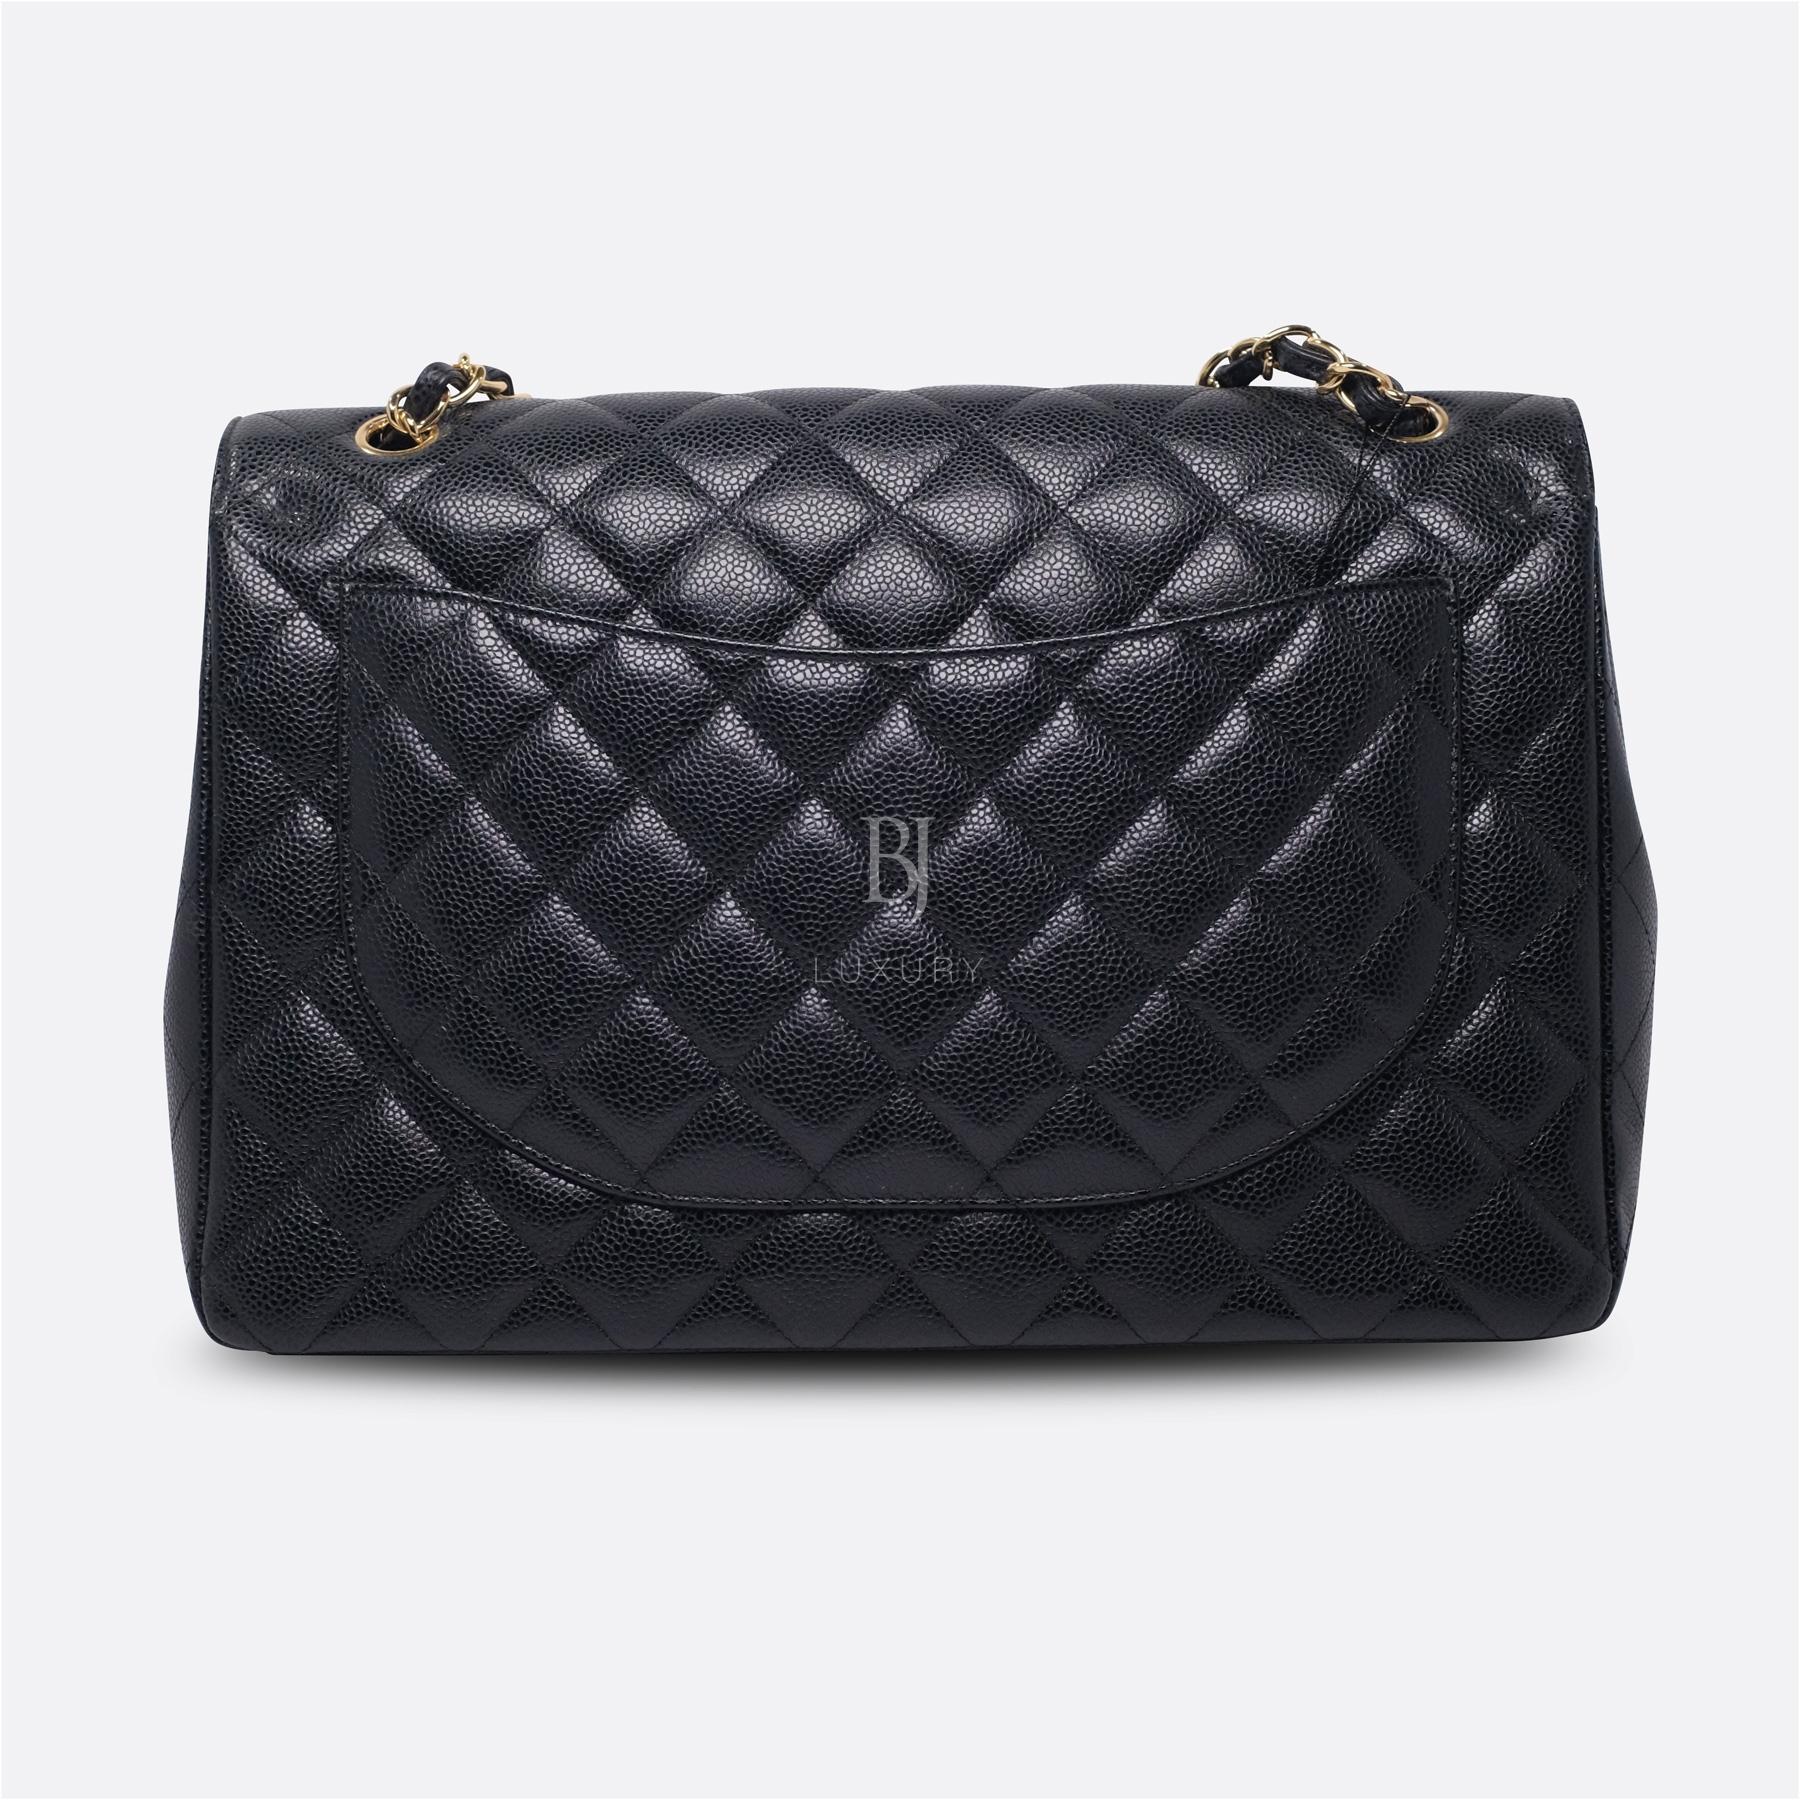 Chanel Classic Handbag Caviar Maxi Black BJ Luxury 5.jpg